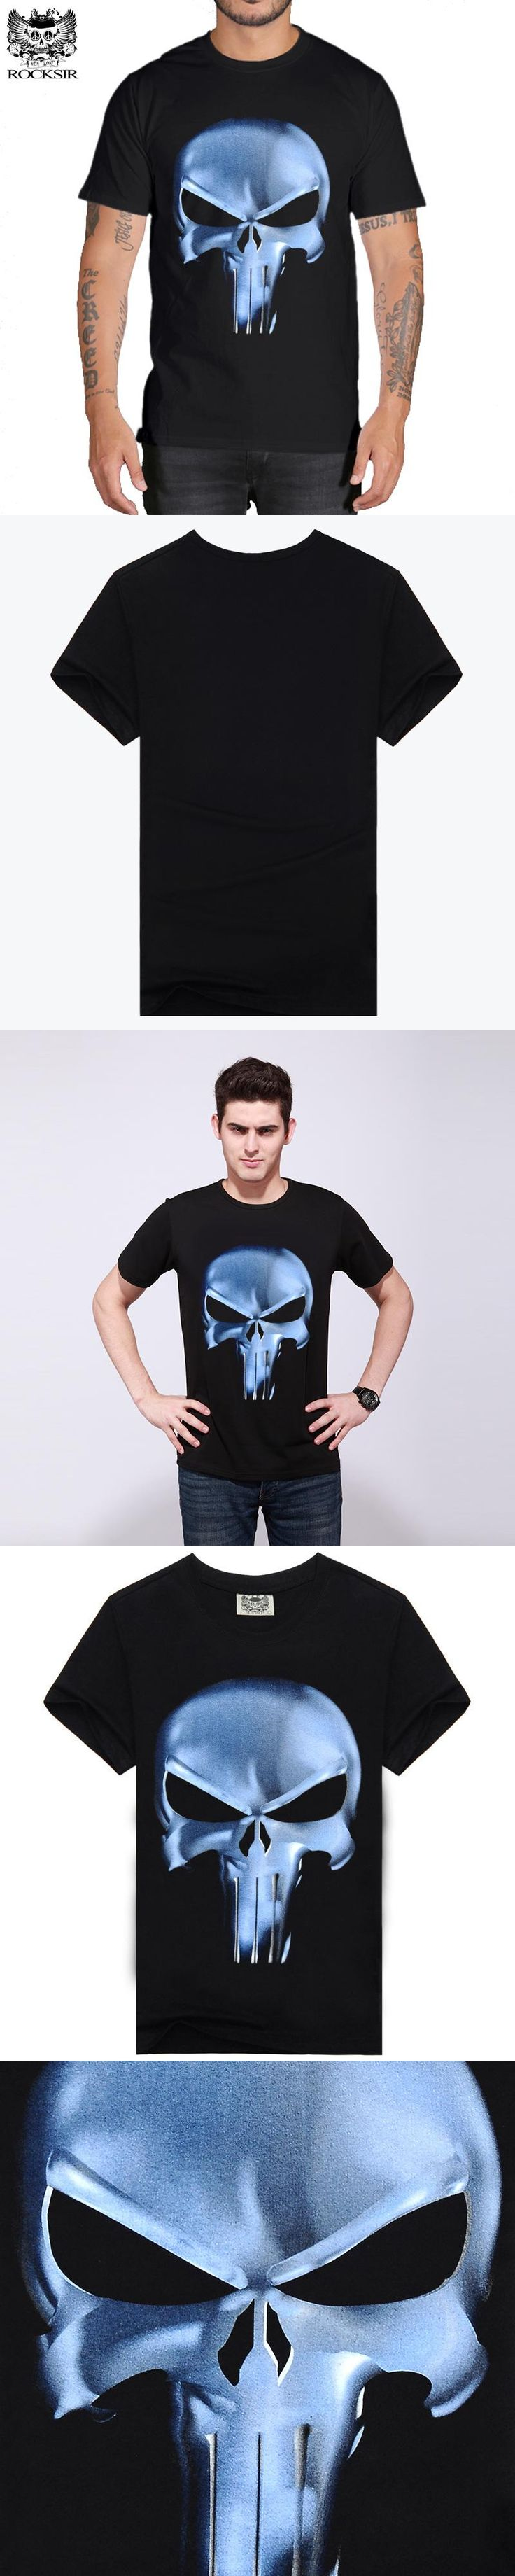 Rocksir punisher t shirt Men Summer punisher Skull Head Grim 3D 100% Cotton t shirts for Men Casual Short Sleeves Brand t-shirt